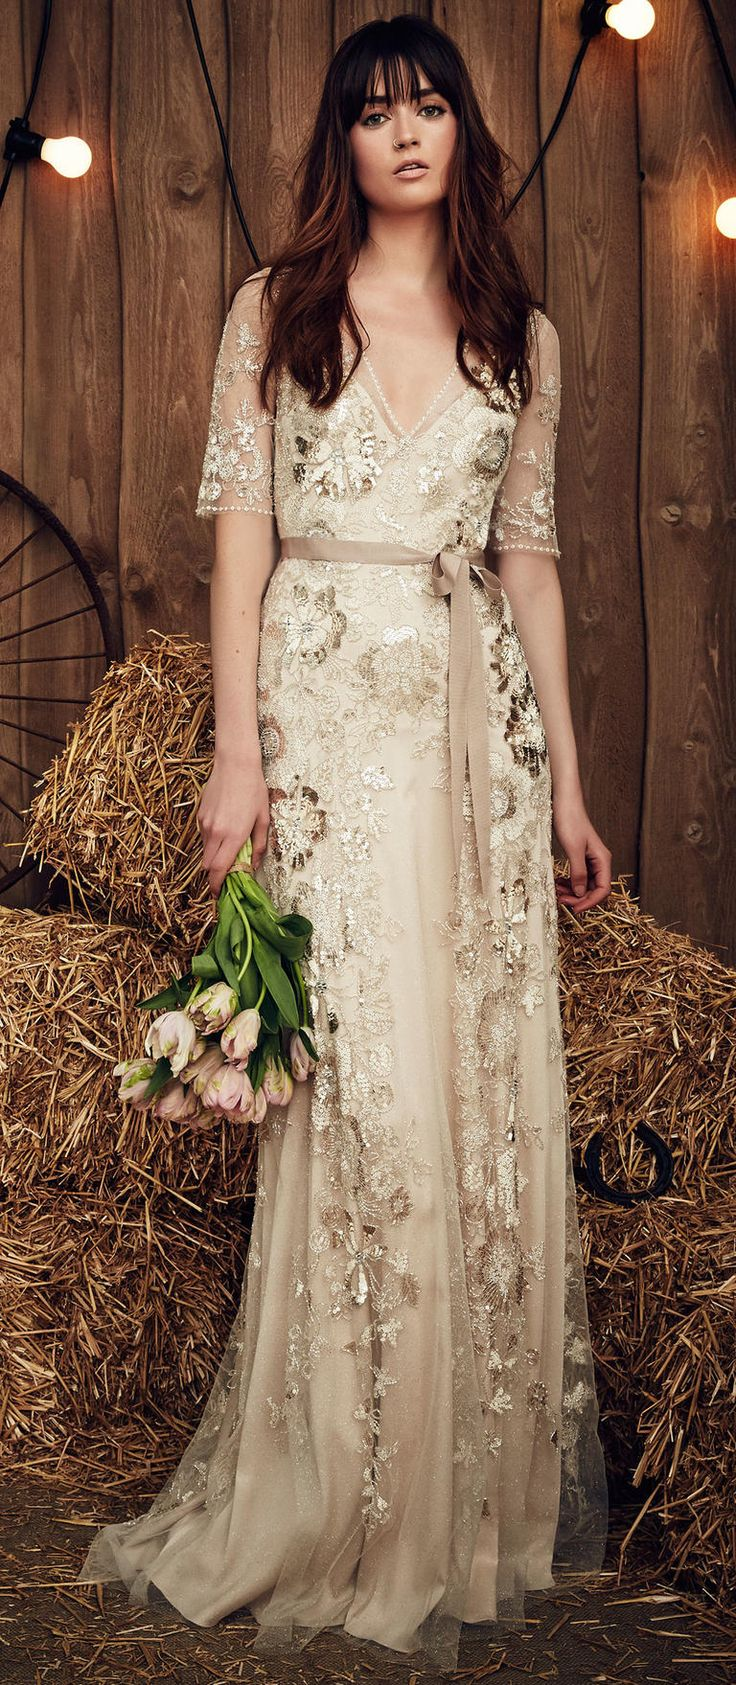 gypsy wedding dresses beige wedding dresses Celadon Green Hits the Runway at Jenny Packham s Gypsy Inspired Spring Show Beige Wedding DressChampagne